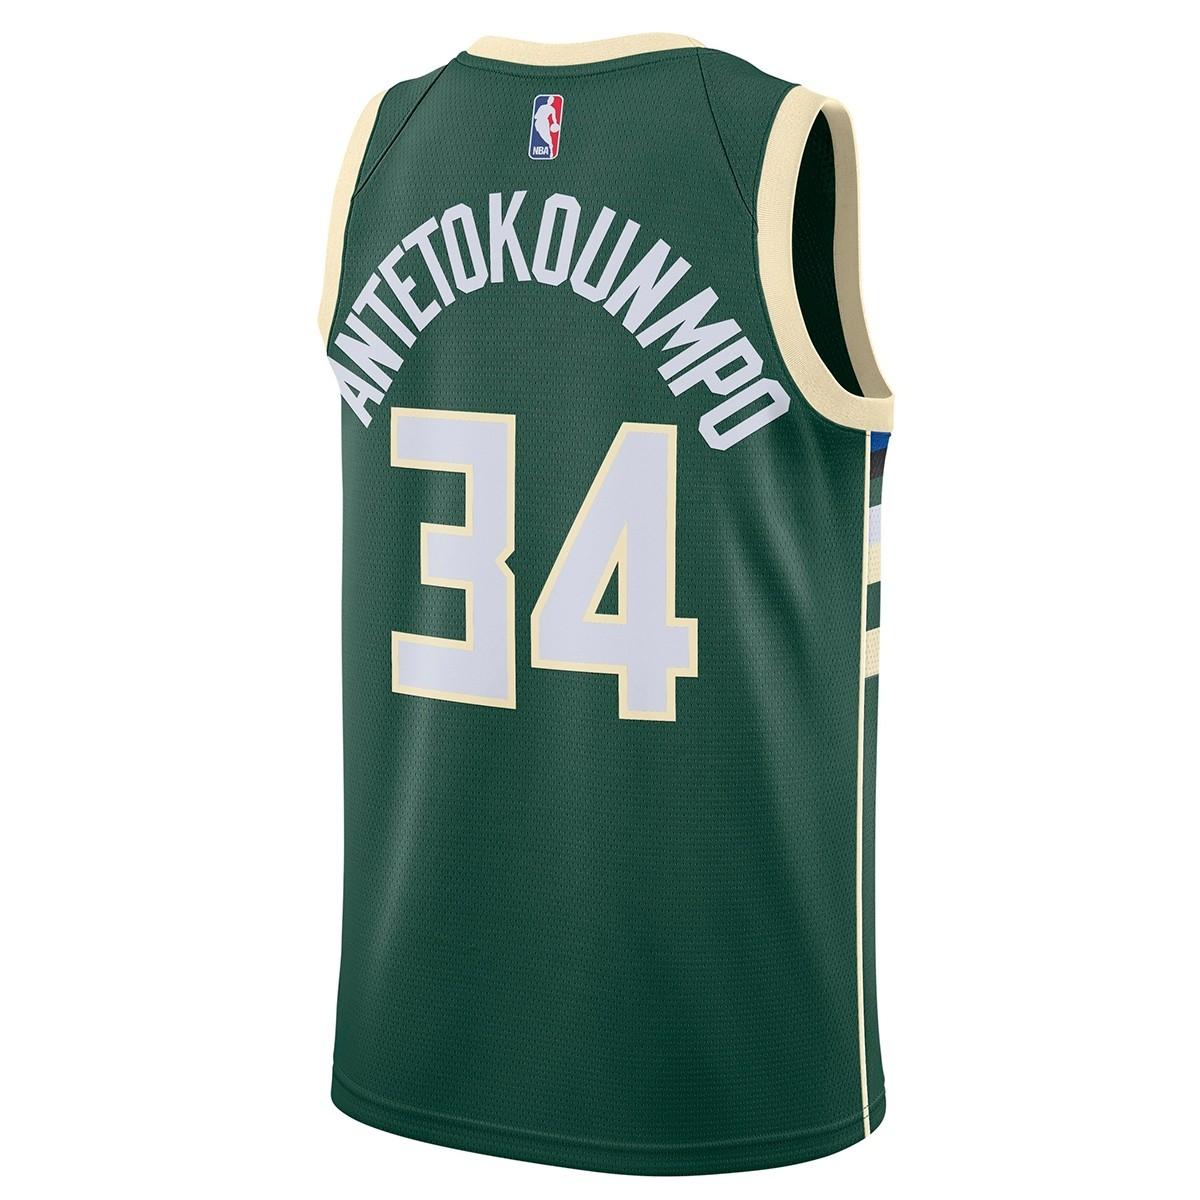 5619d4a95ee Nike NBA Bucks Swingman Jersey Antetokounmpo  Icon Edition  864489-323